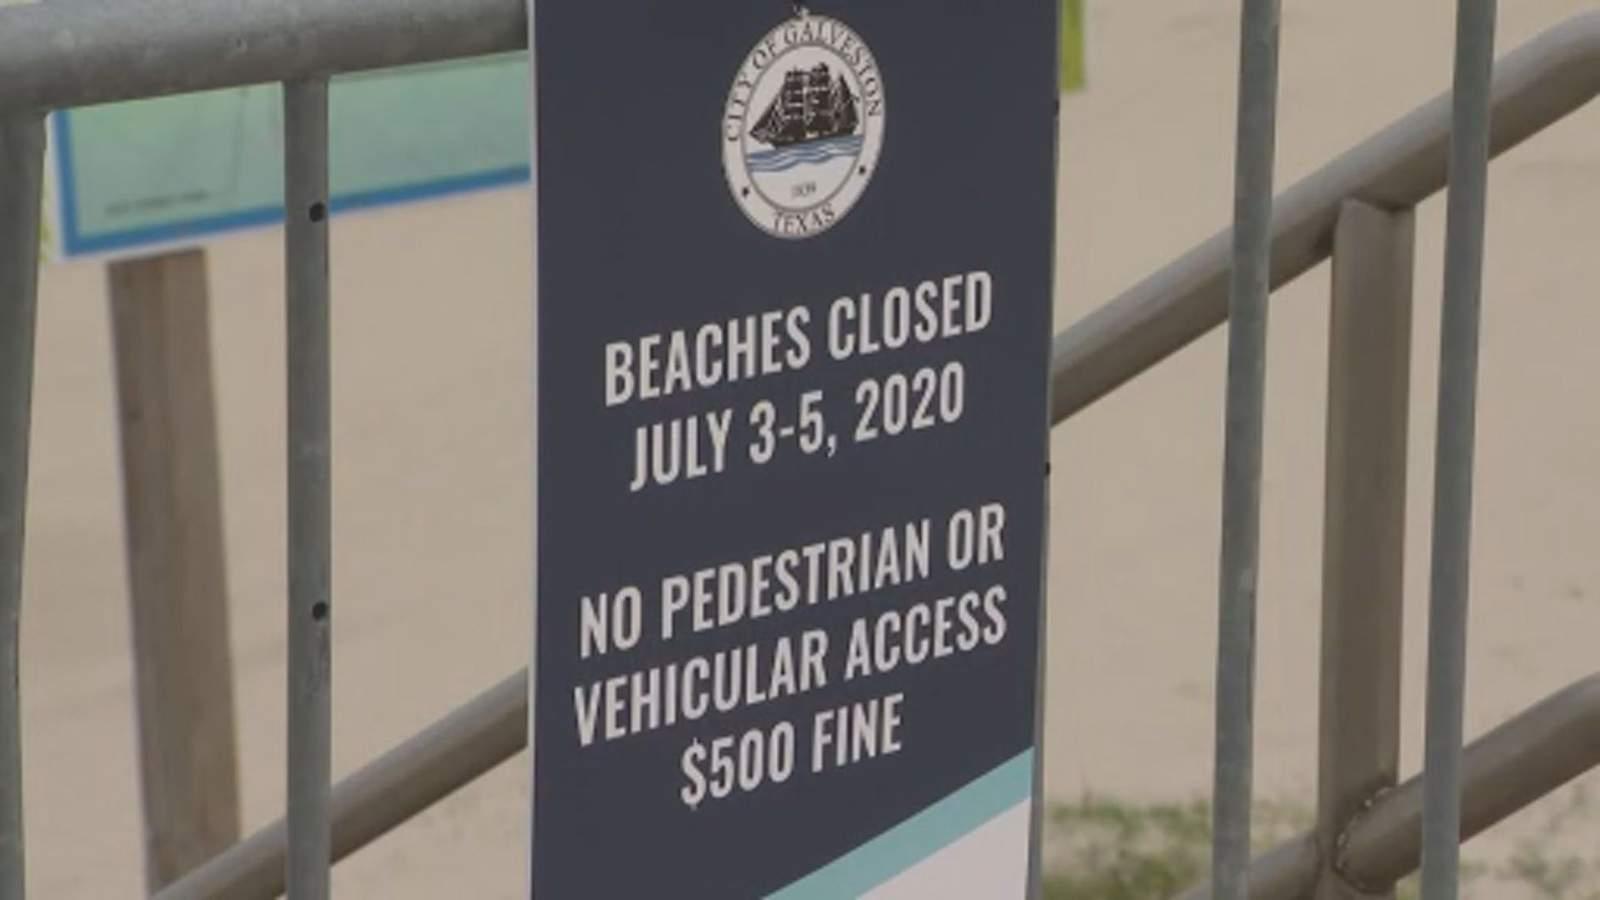 'Just doesn't make sense to me': Galveston locals, tourists react to beach closures